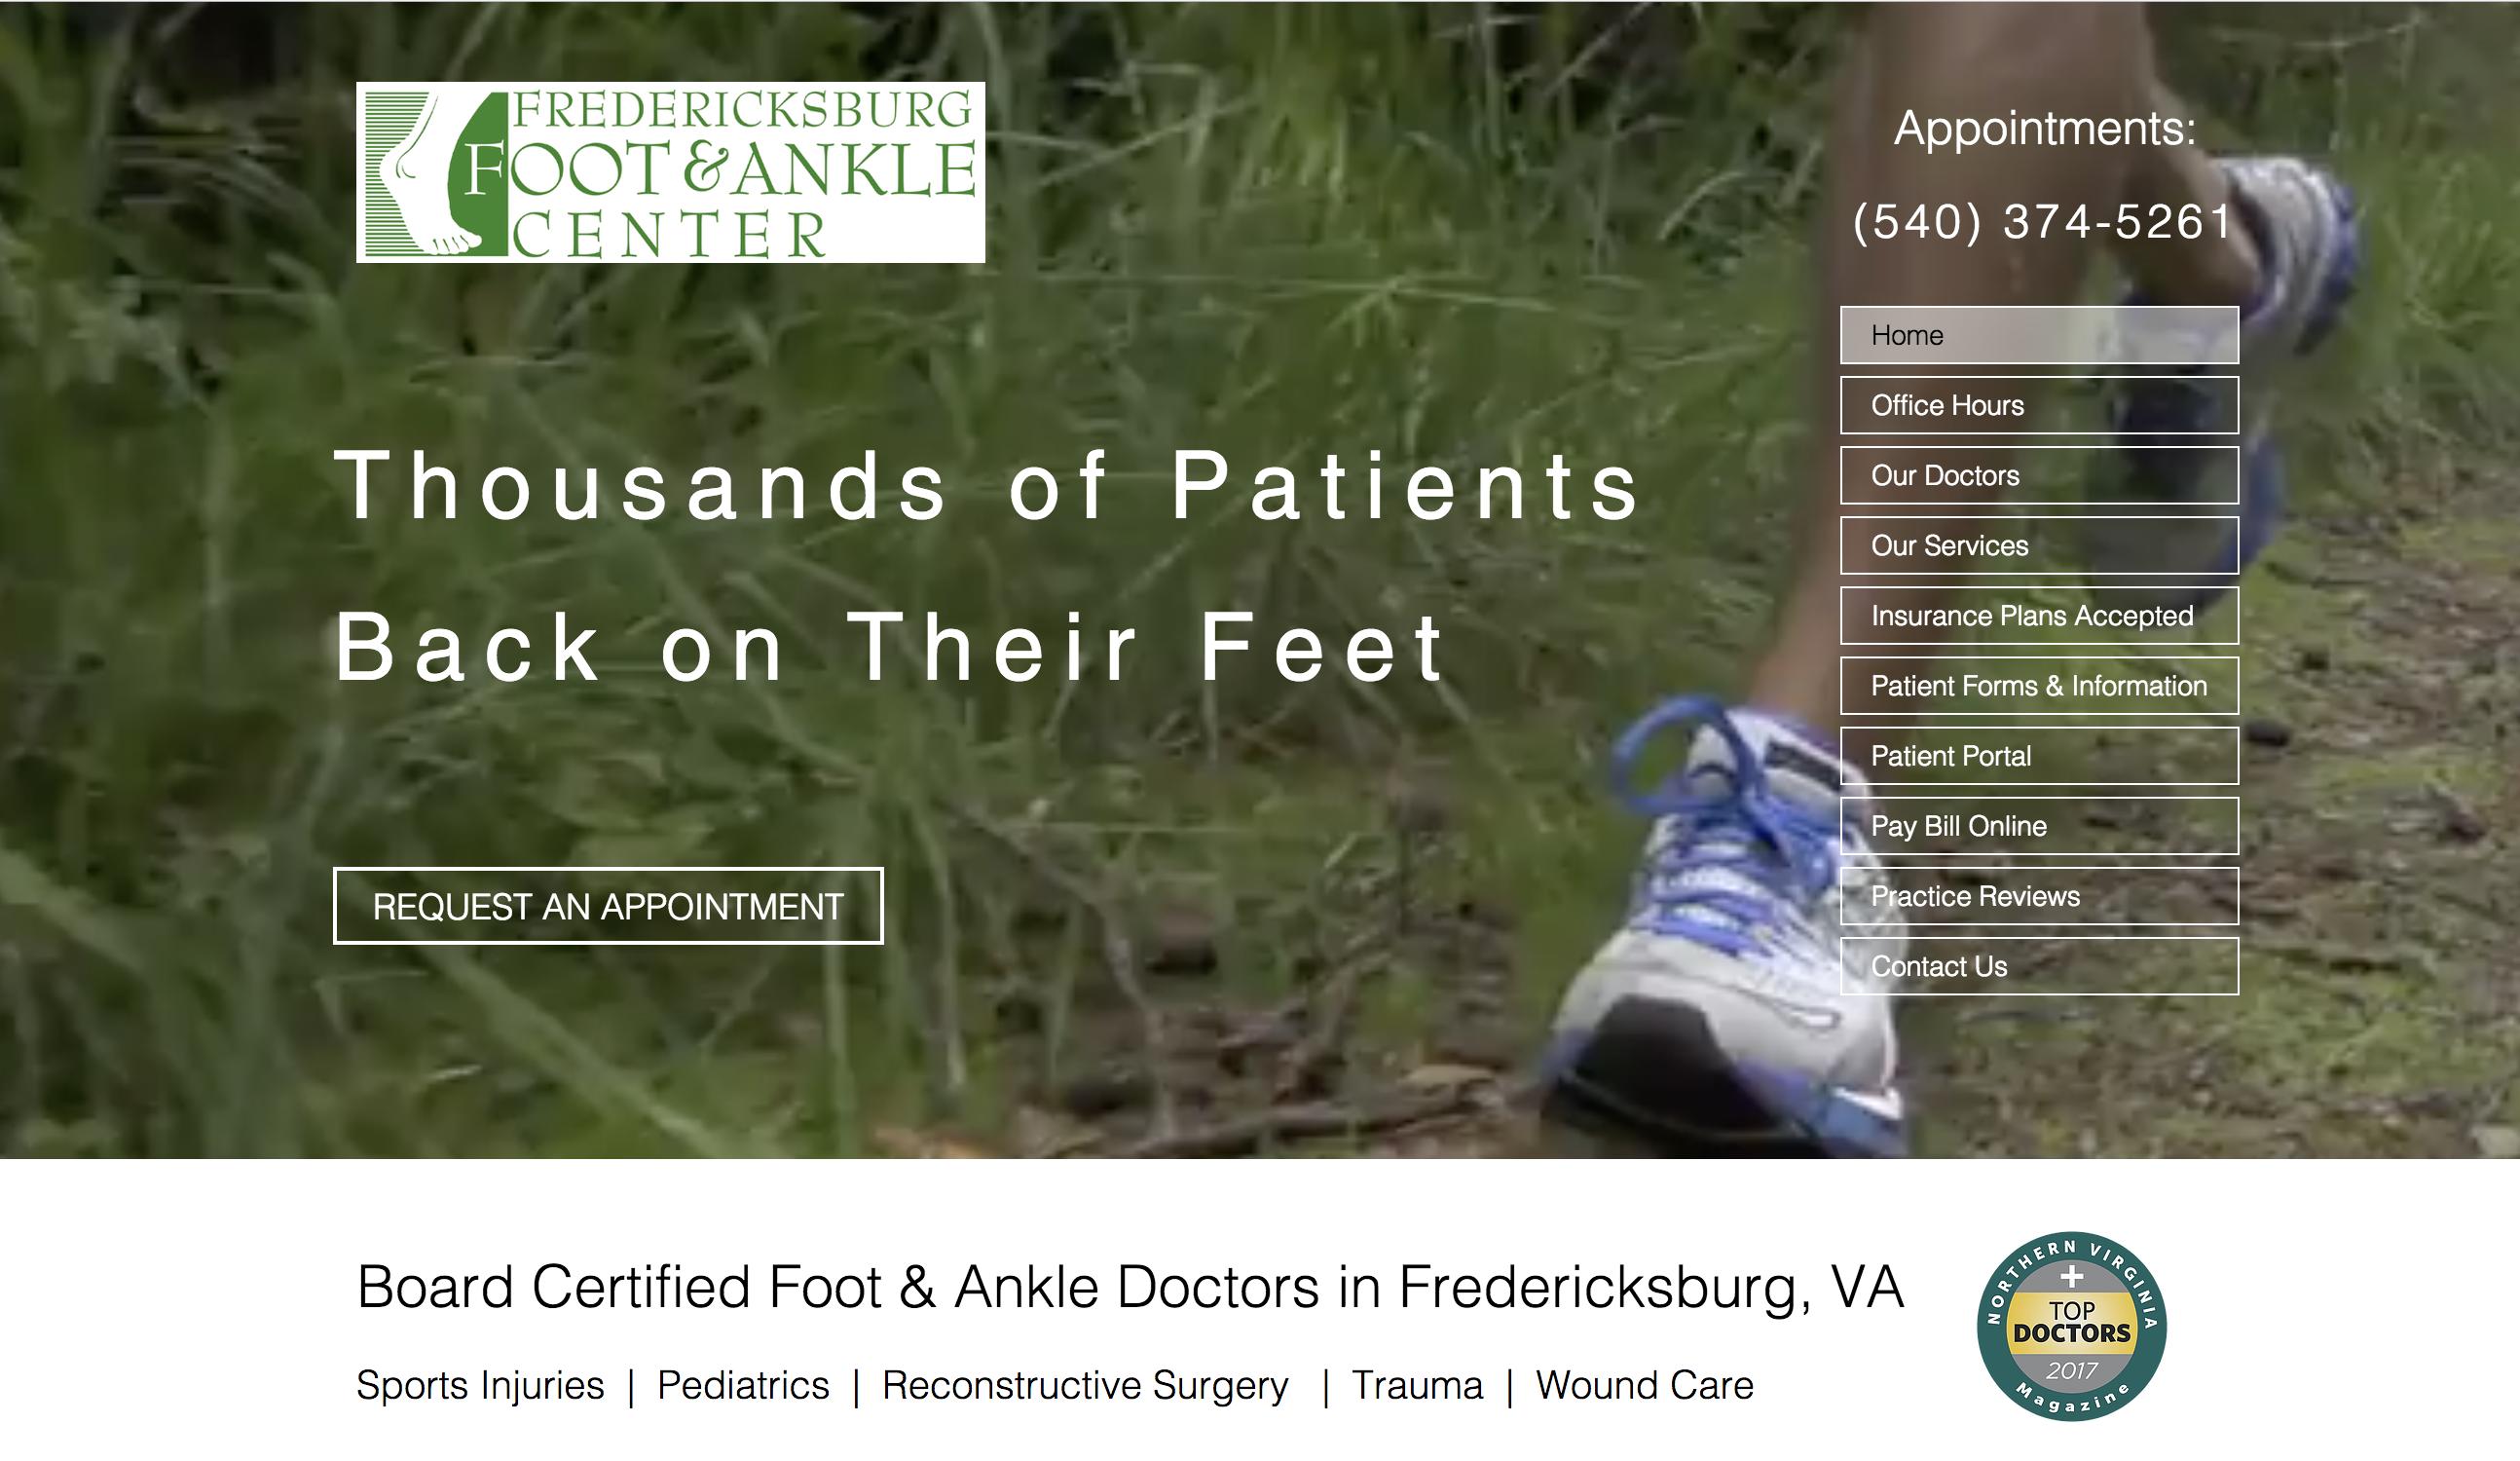 Podiatrist In Fredericksburg Va Fredericksburg Foot Ankle Center